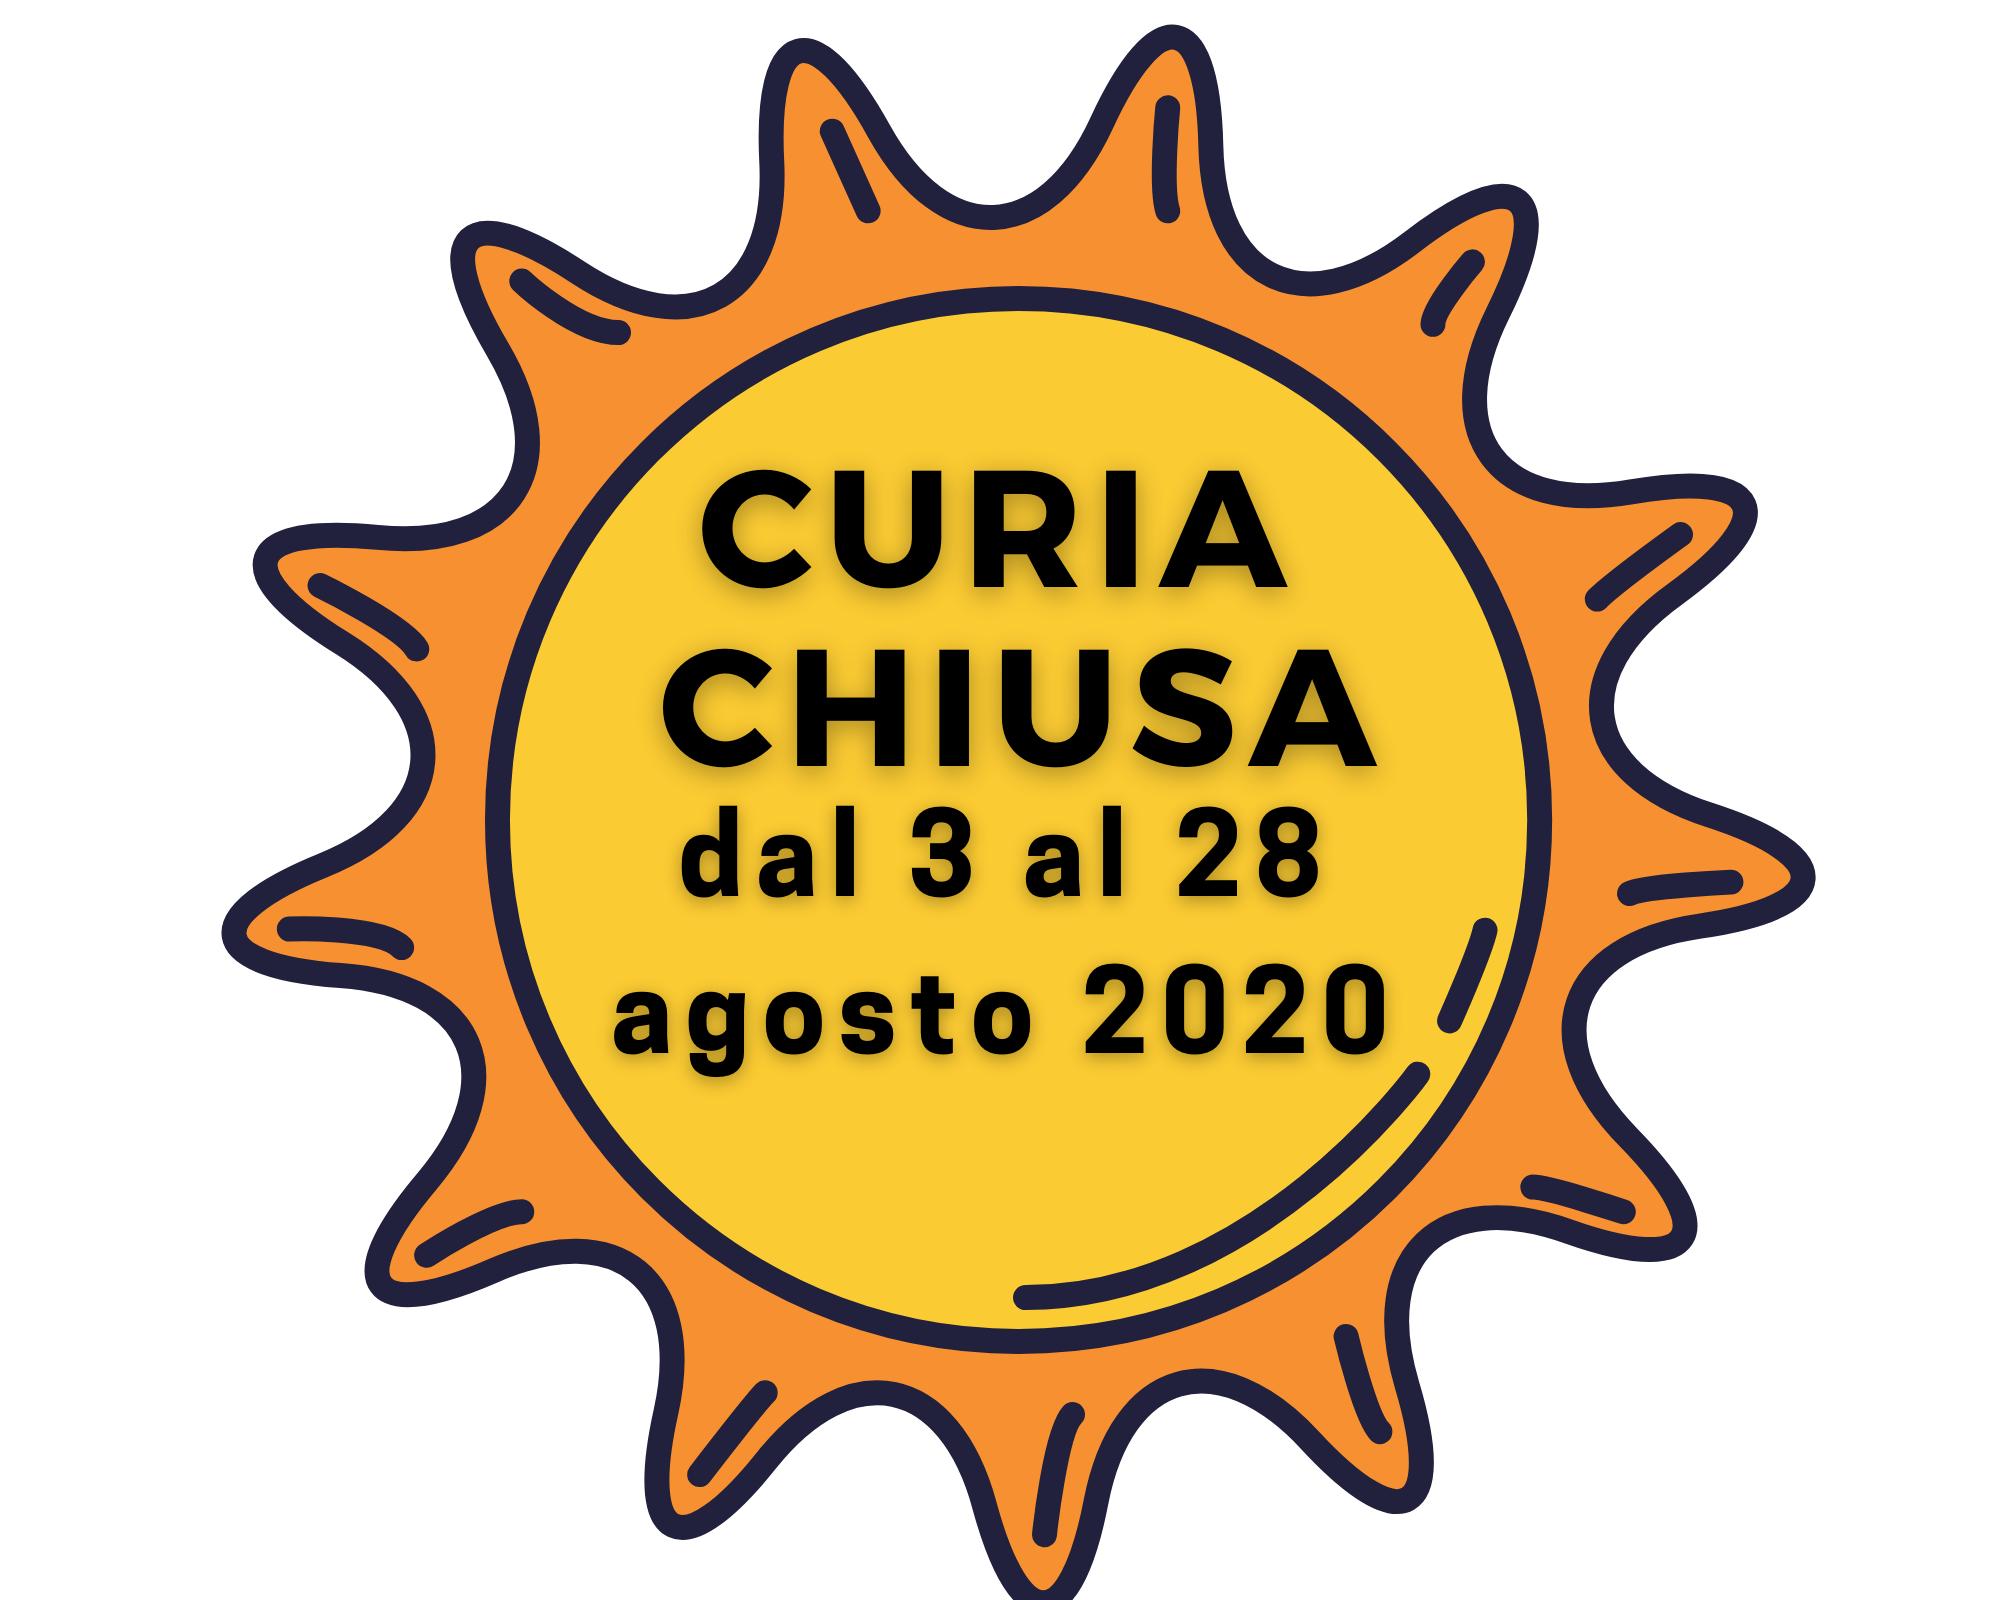 Curia chiusa estate 2020